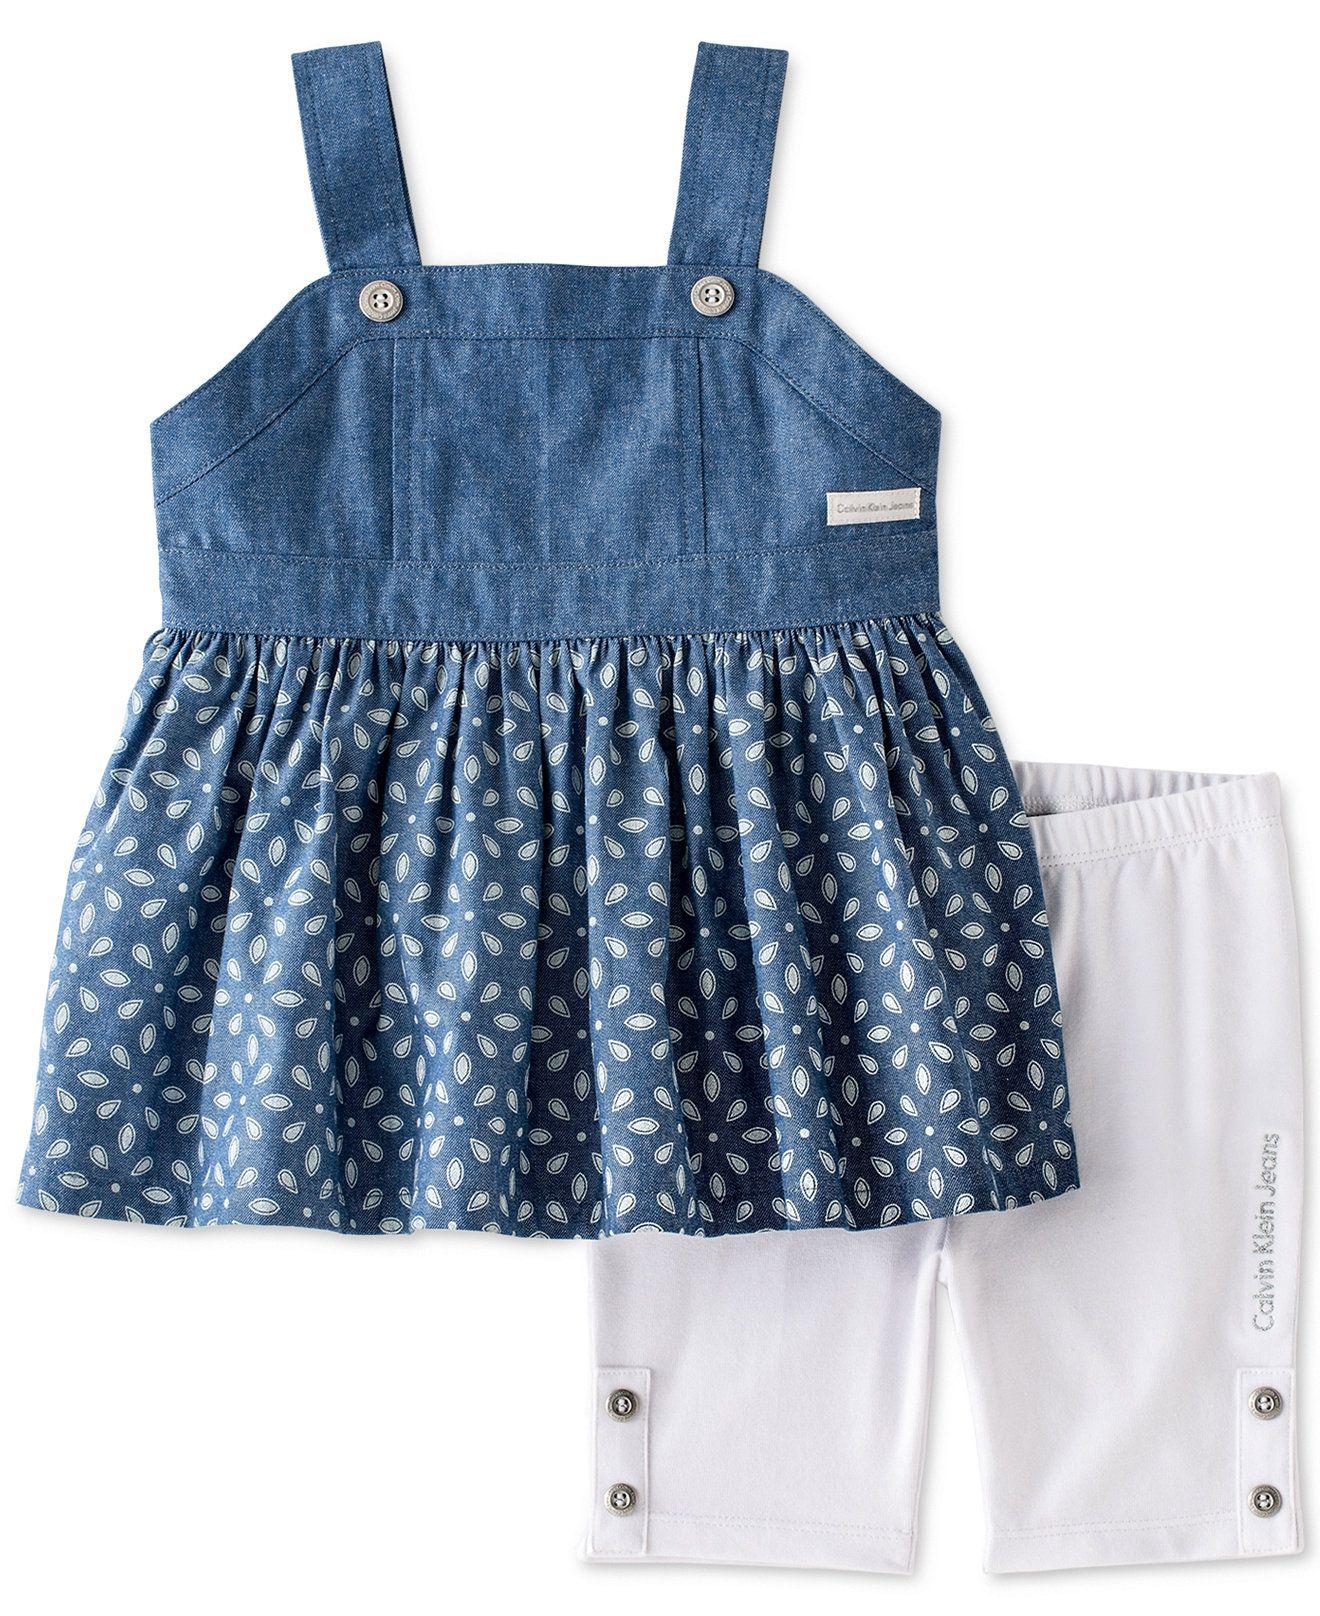 4a583133c26 Calvin Klein Baby Girls' 2-Piece Top & Shorts Set - Kids Baby Girl ...